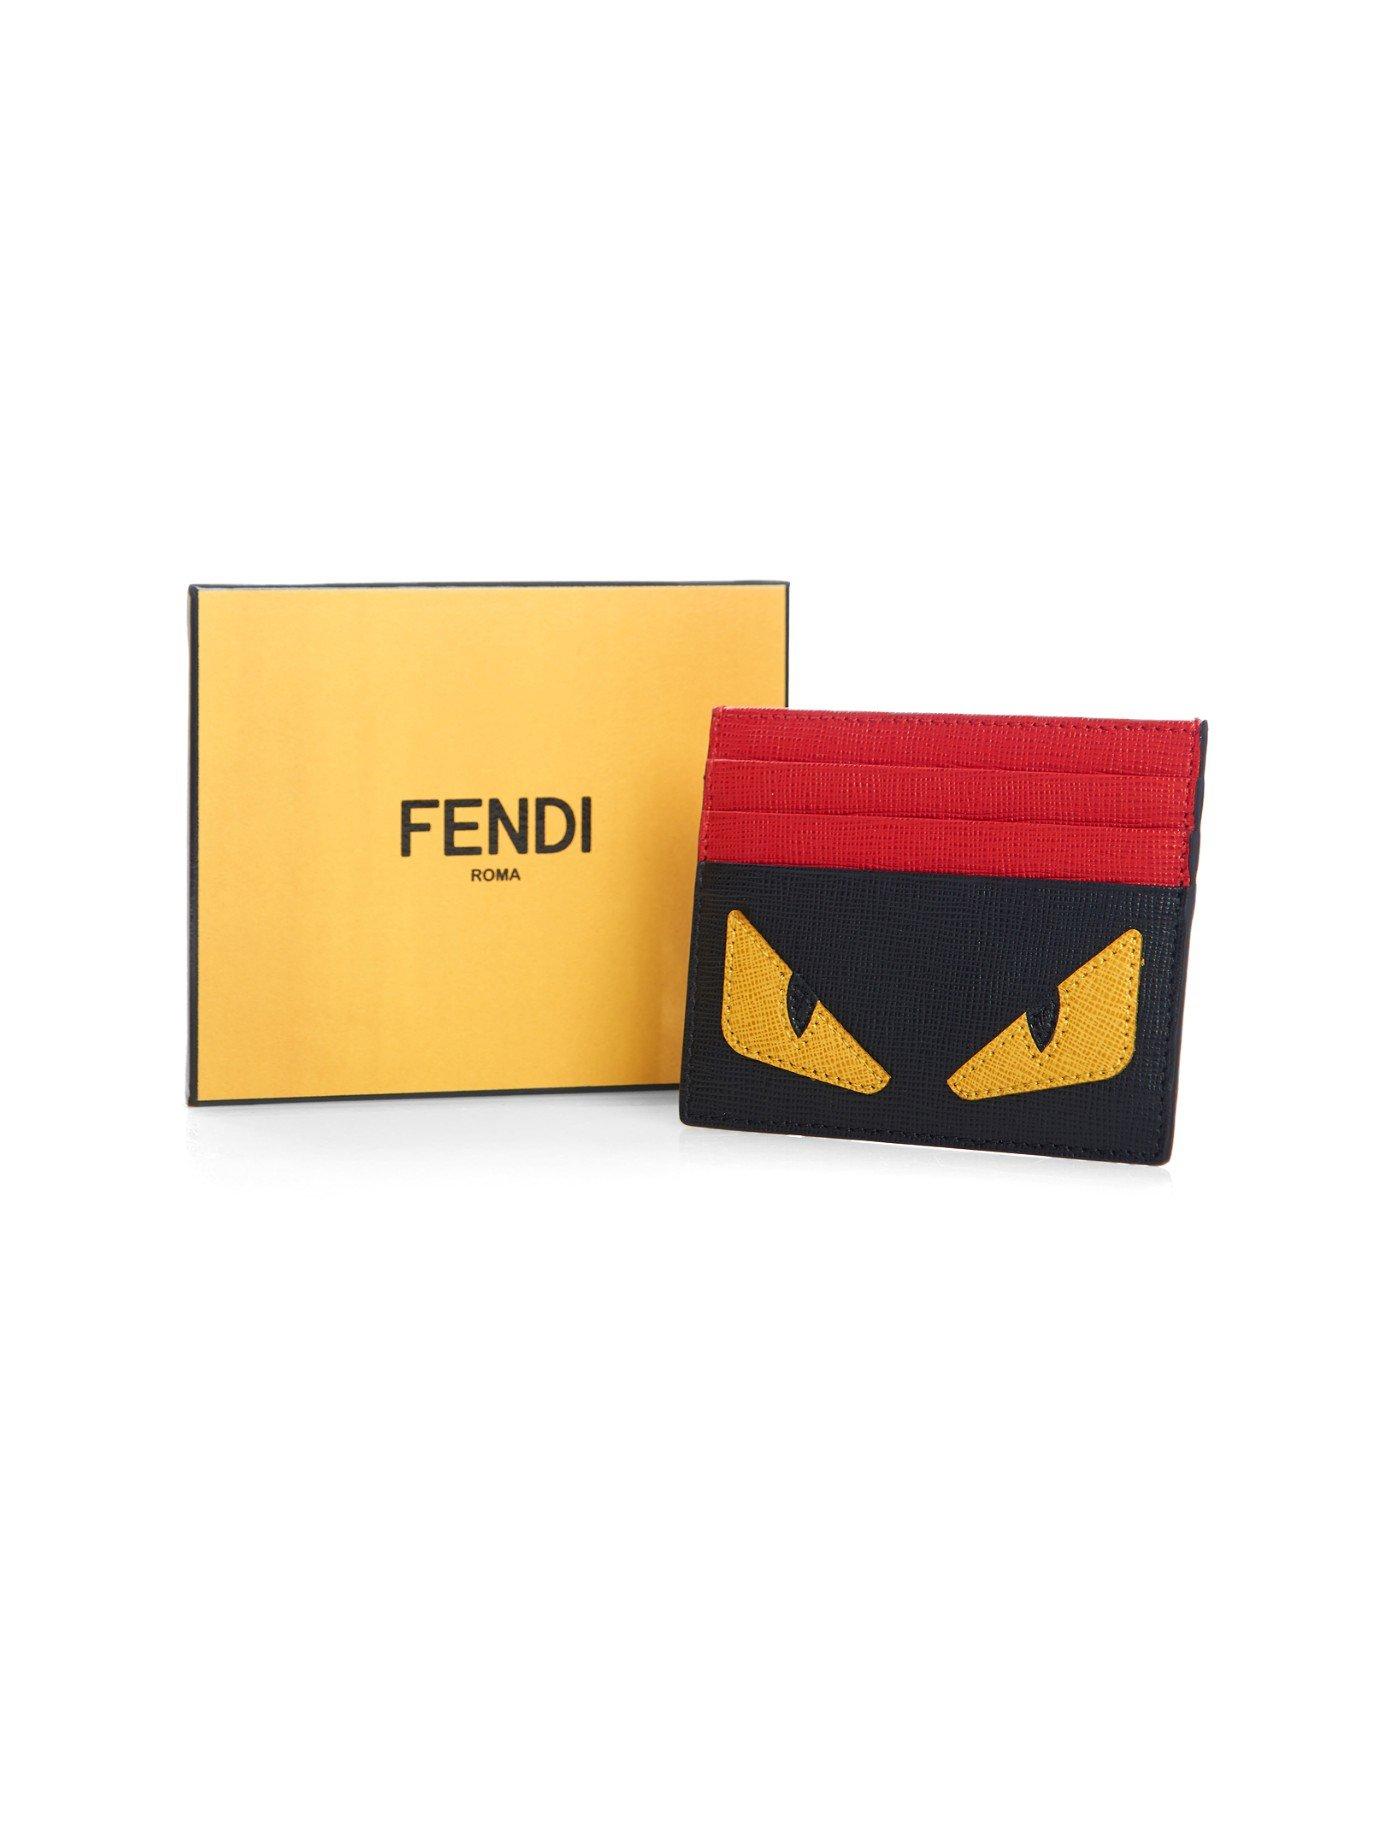 76086978 Fendi Black Bag Bugs Leather Cardholder for men